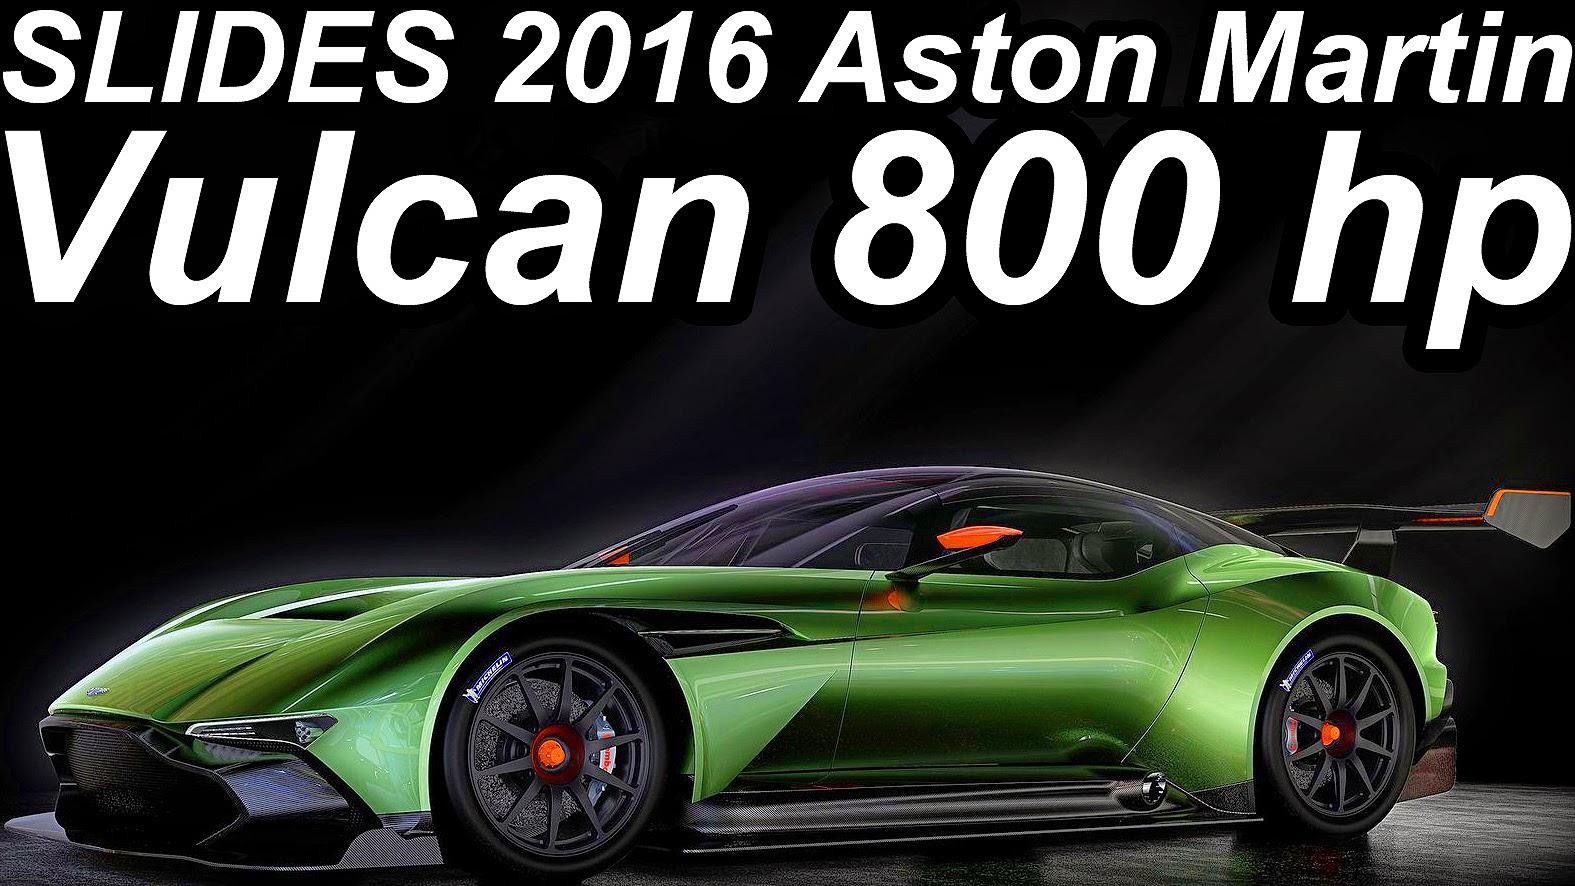 Carwp Slides Aston Martin Vulcan 2016 Rwd 7 0 V12 800 Cv